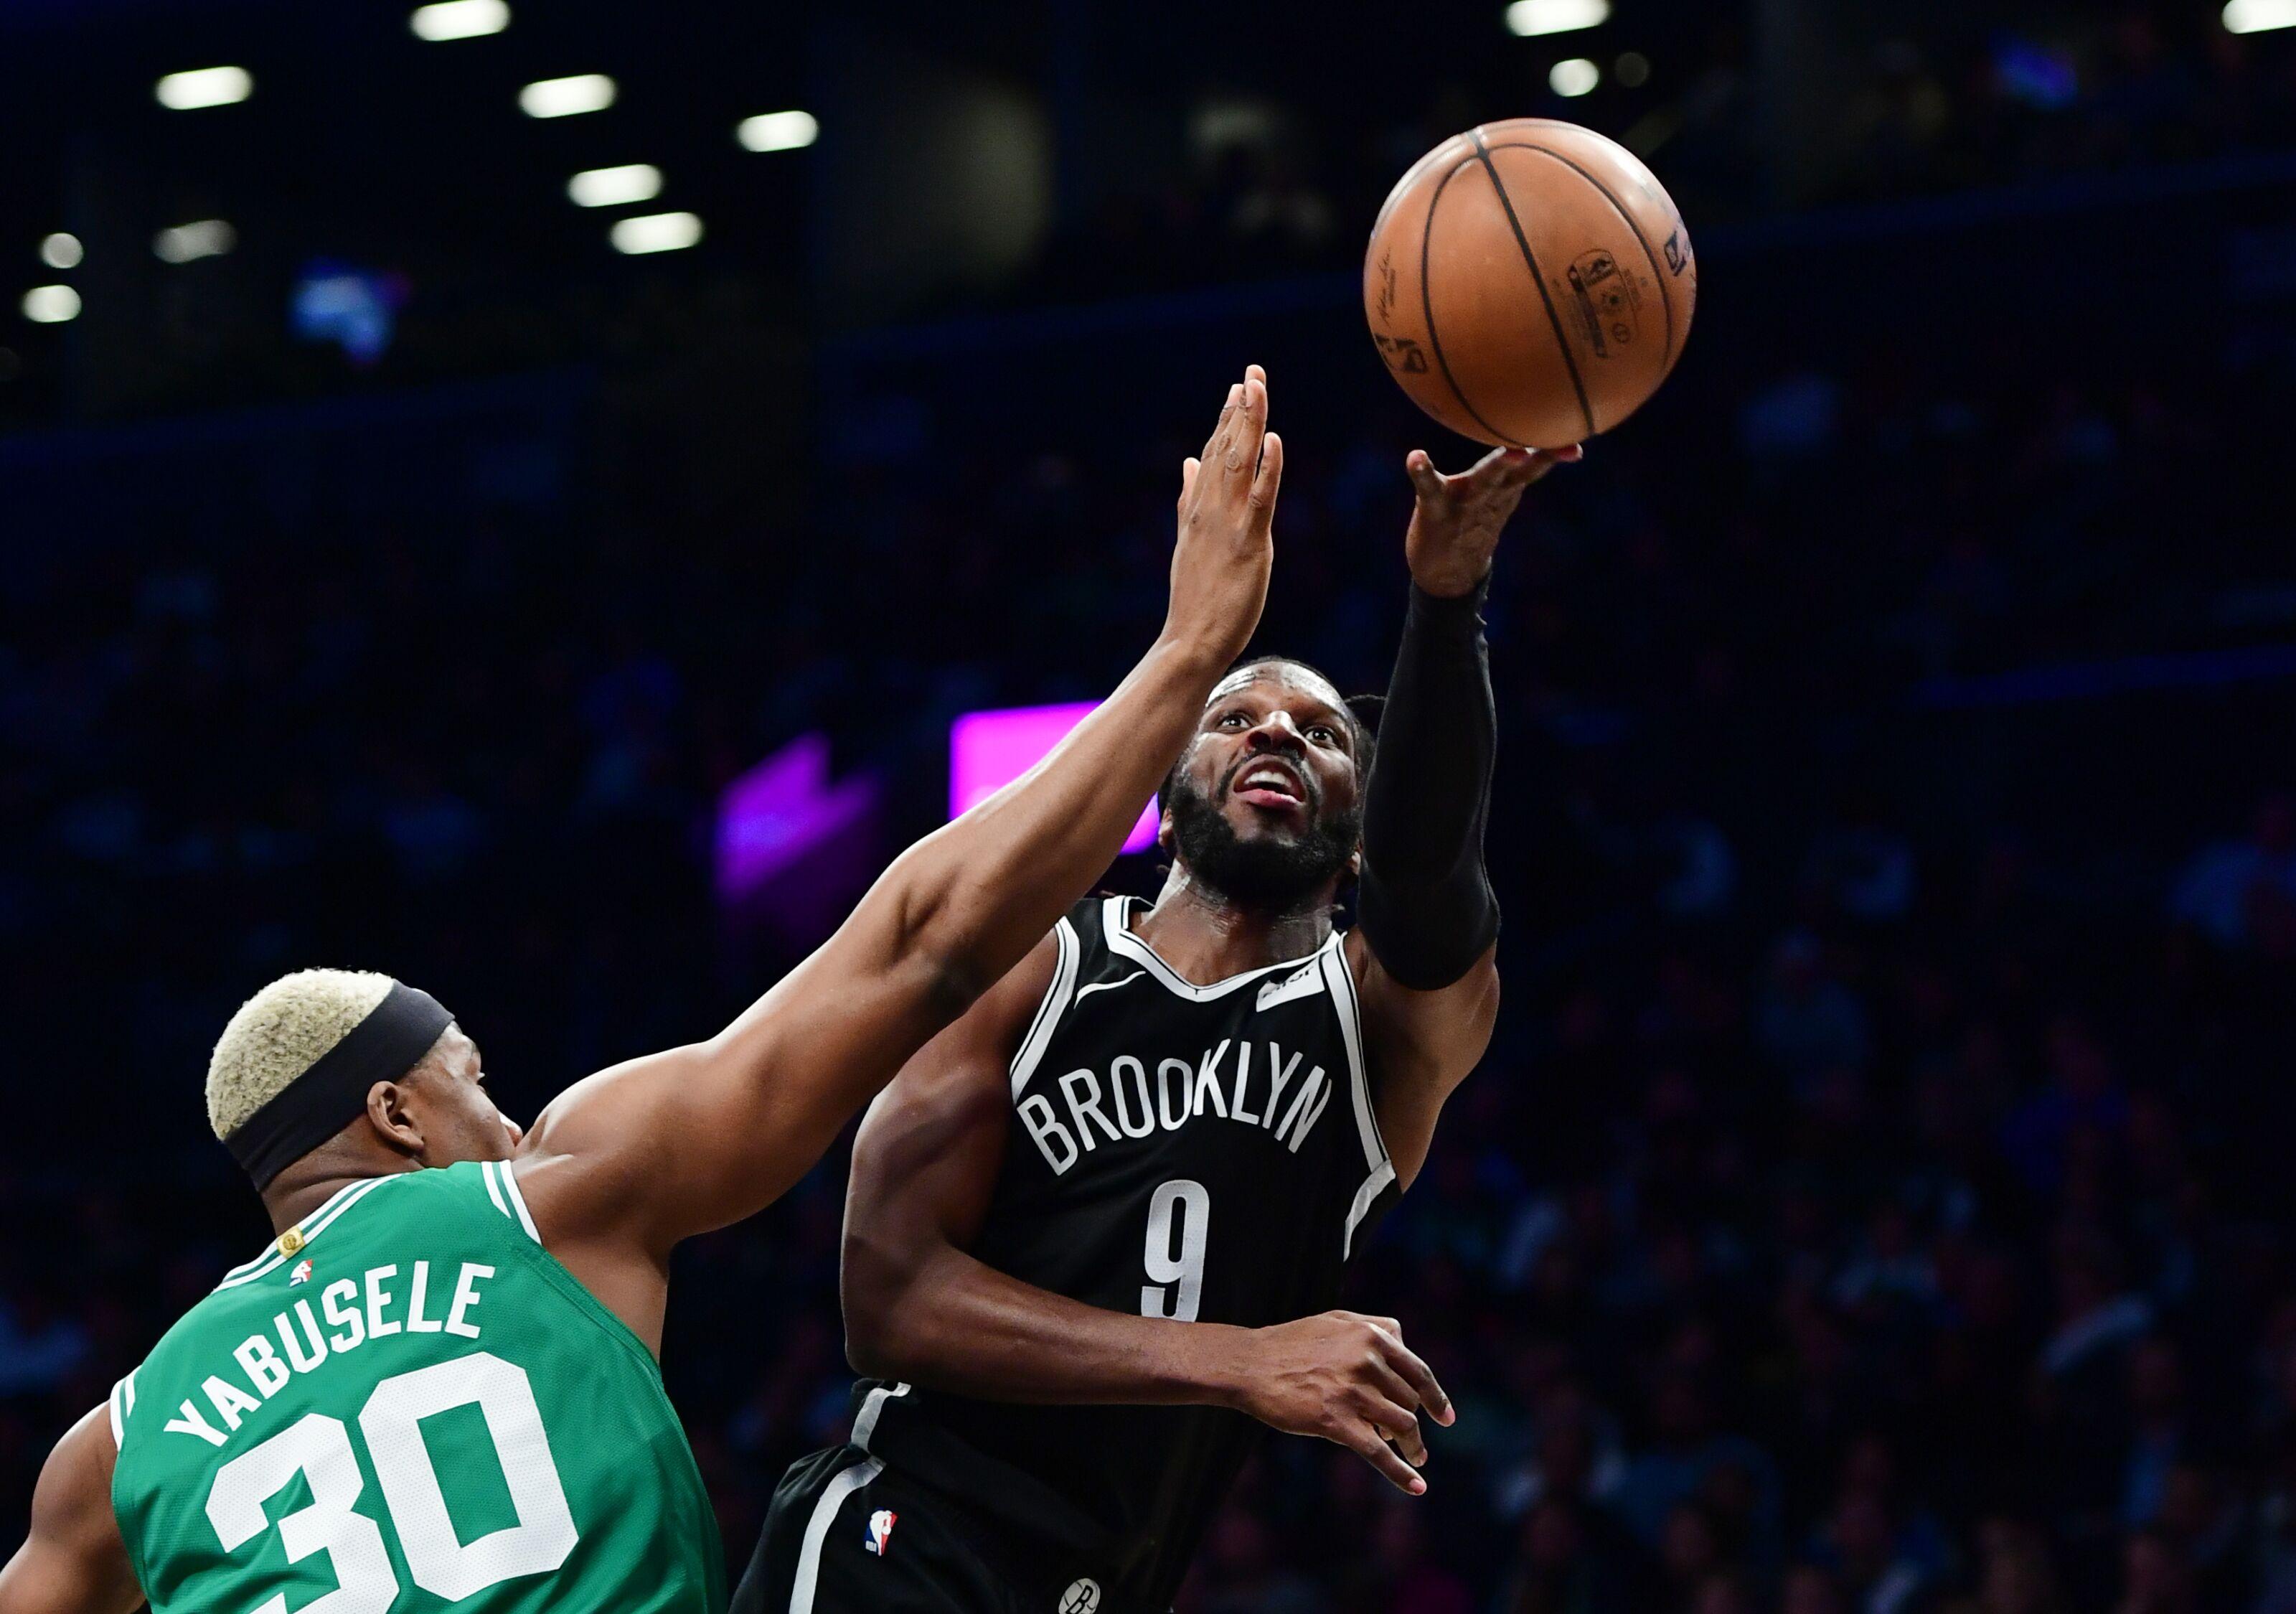 a06b3a0ba6ab Brooklyn Nets vs. Boston Celtics  Live stream